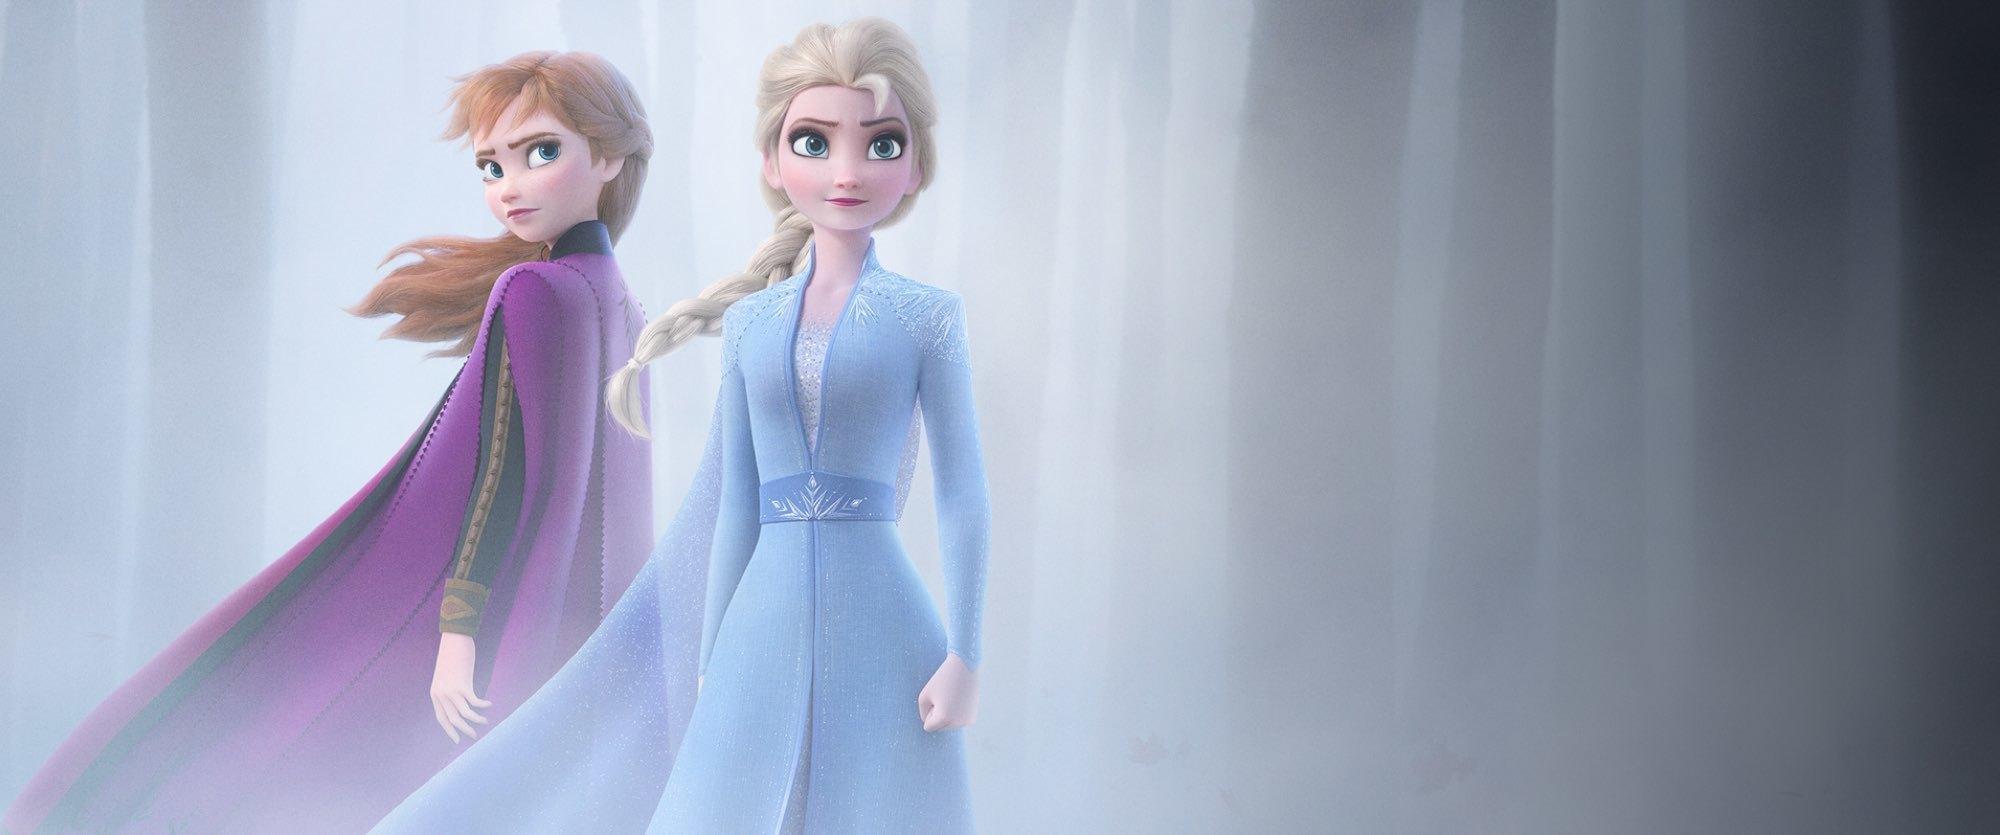 La Reine des Neiges Trailer